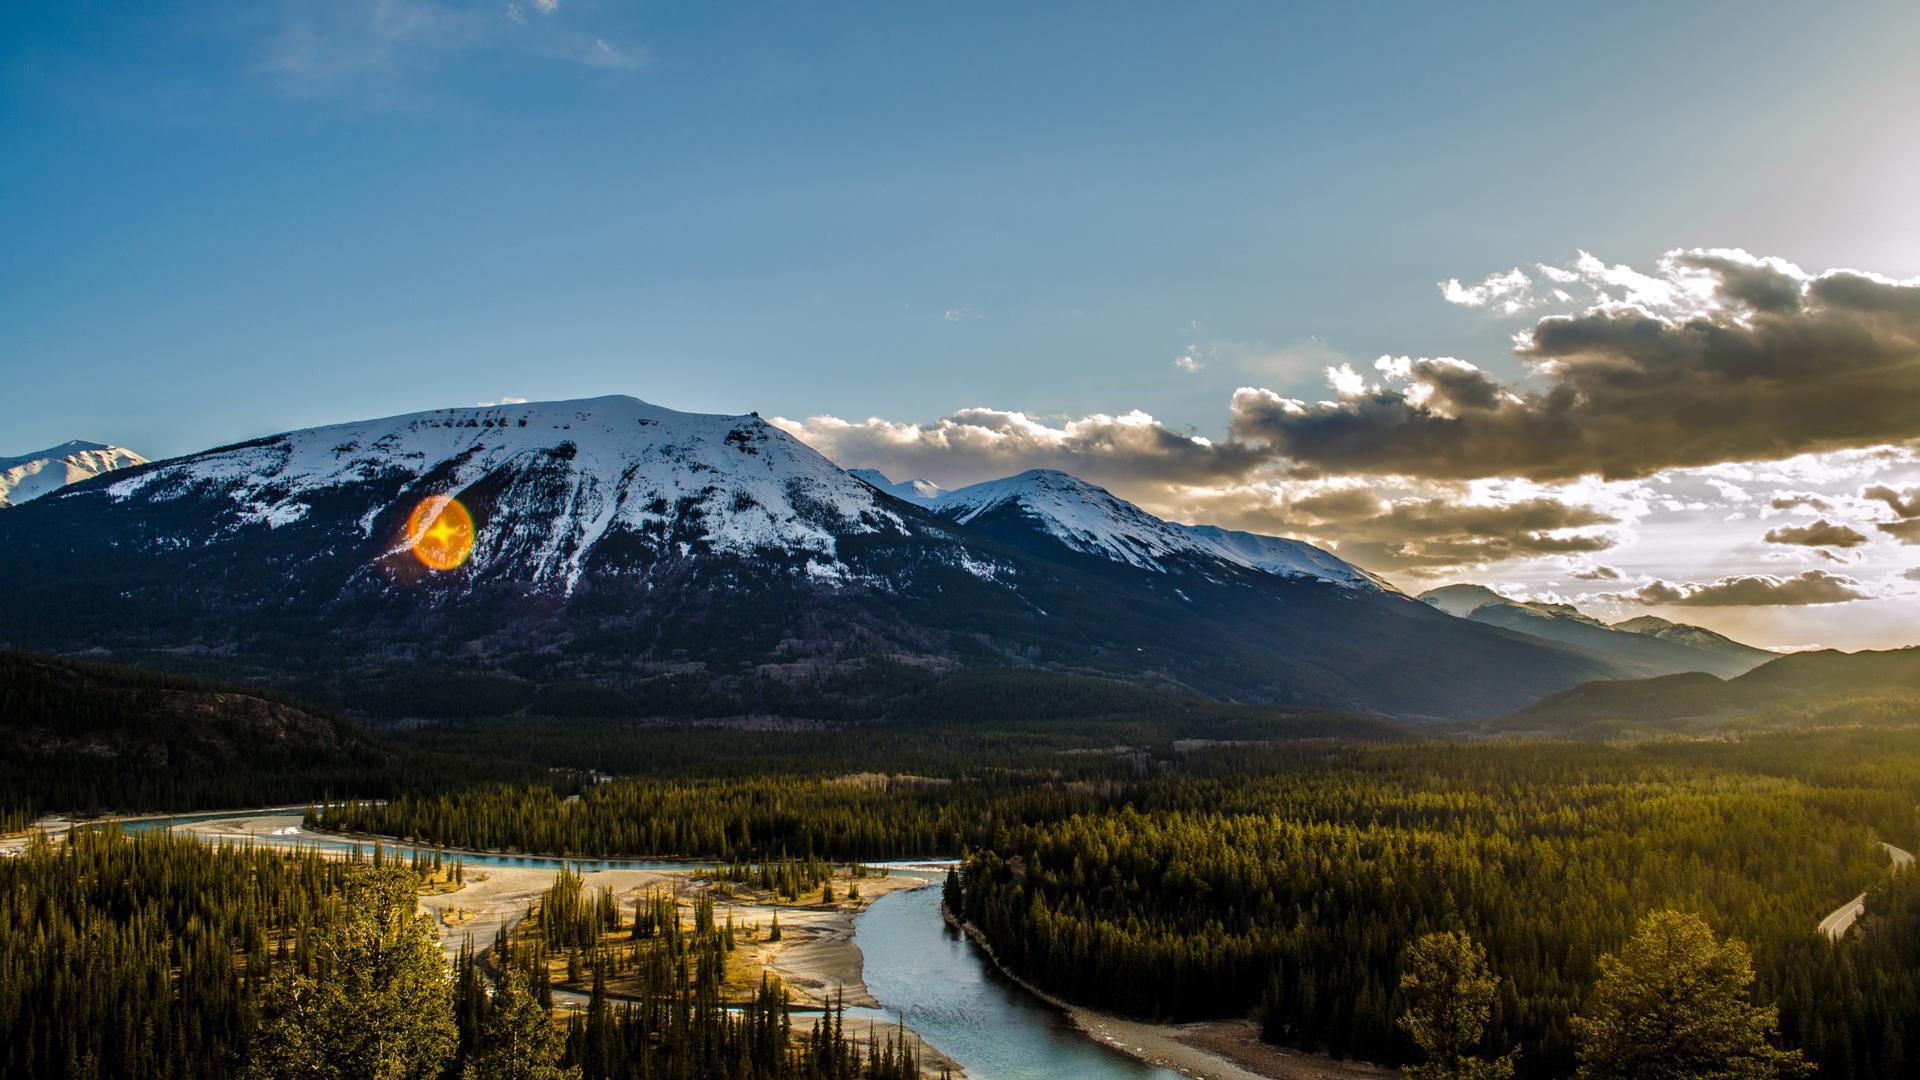 Canada full hd hdtv fhd p wallpapers hd desktop backgrounds